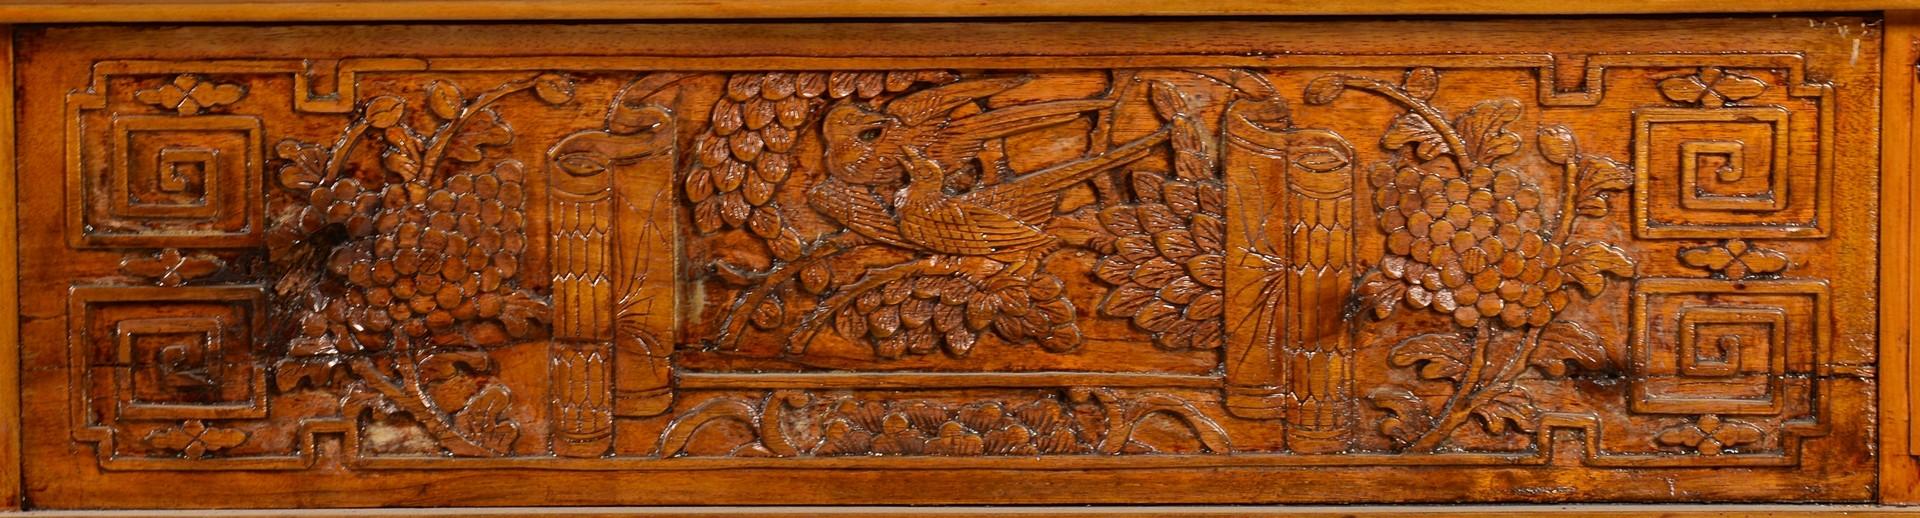 Lot 732: Carved Tibetan Table & Bronze Buddha Head